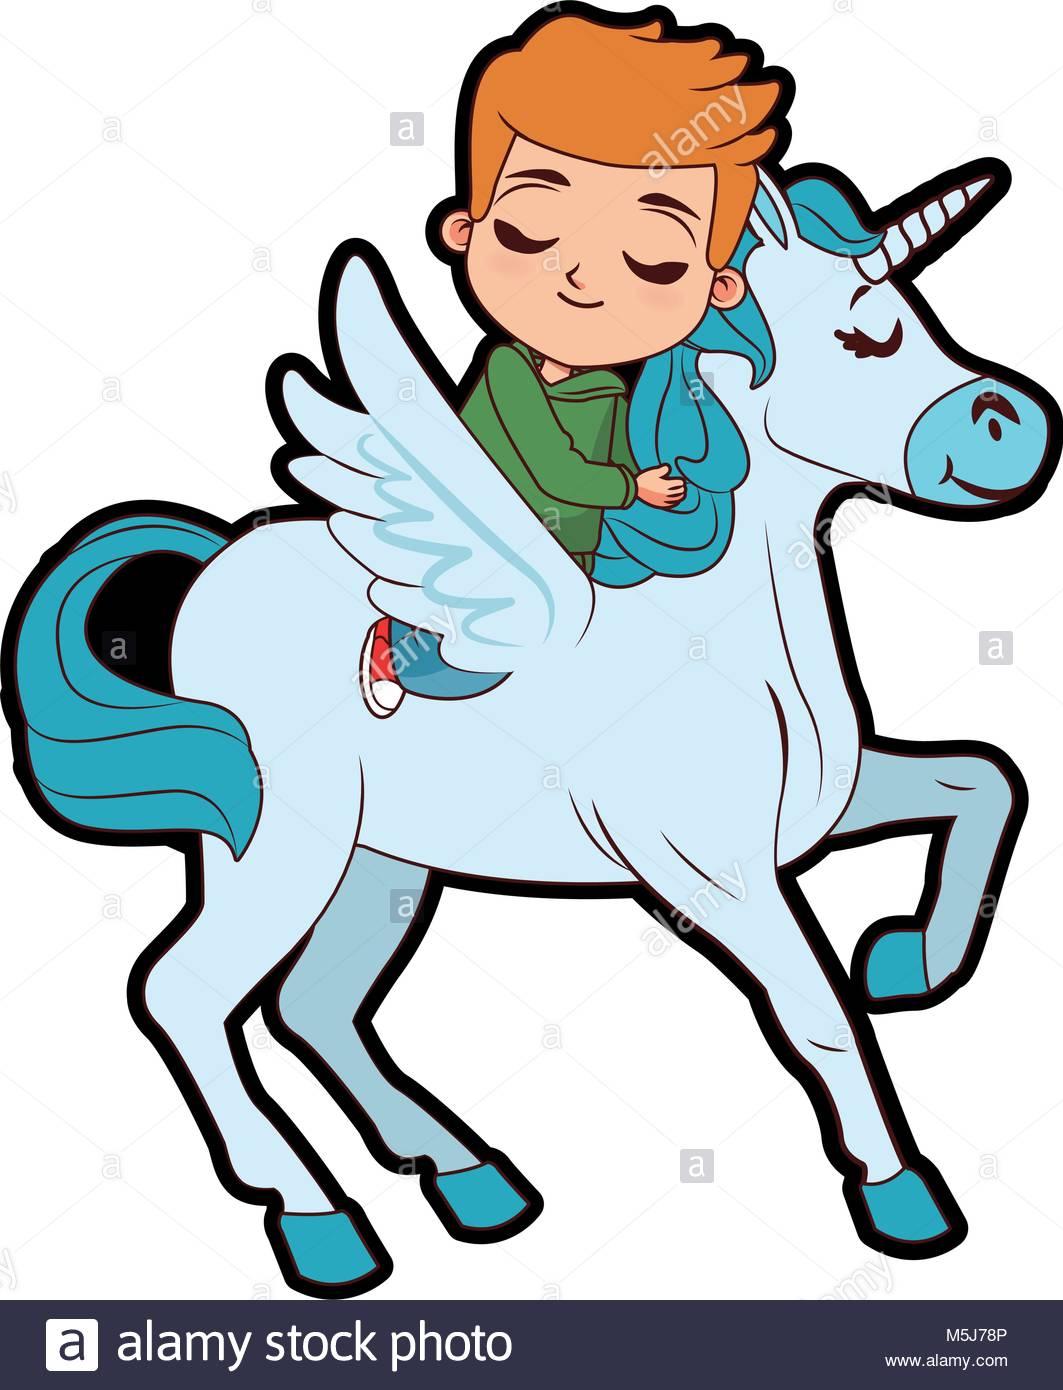 Cute boy on unicorn Stock Vector Art & Illustration, Vector Image.